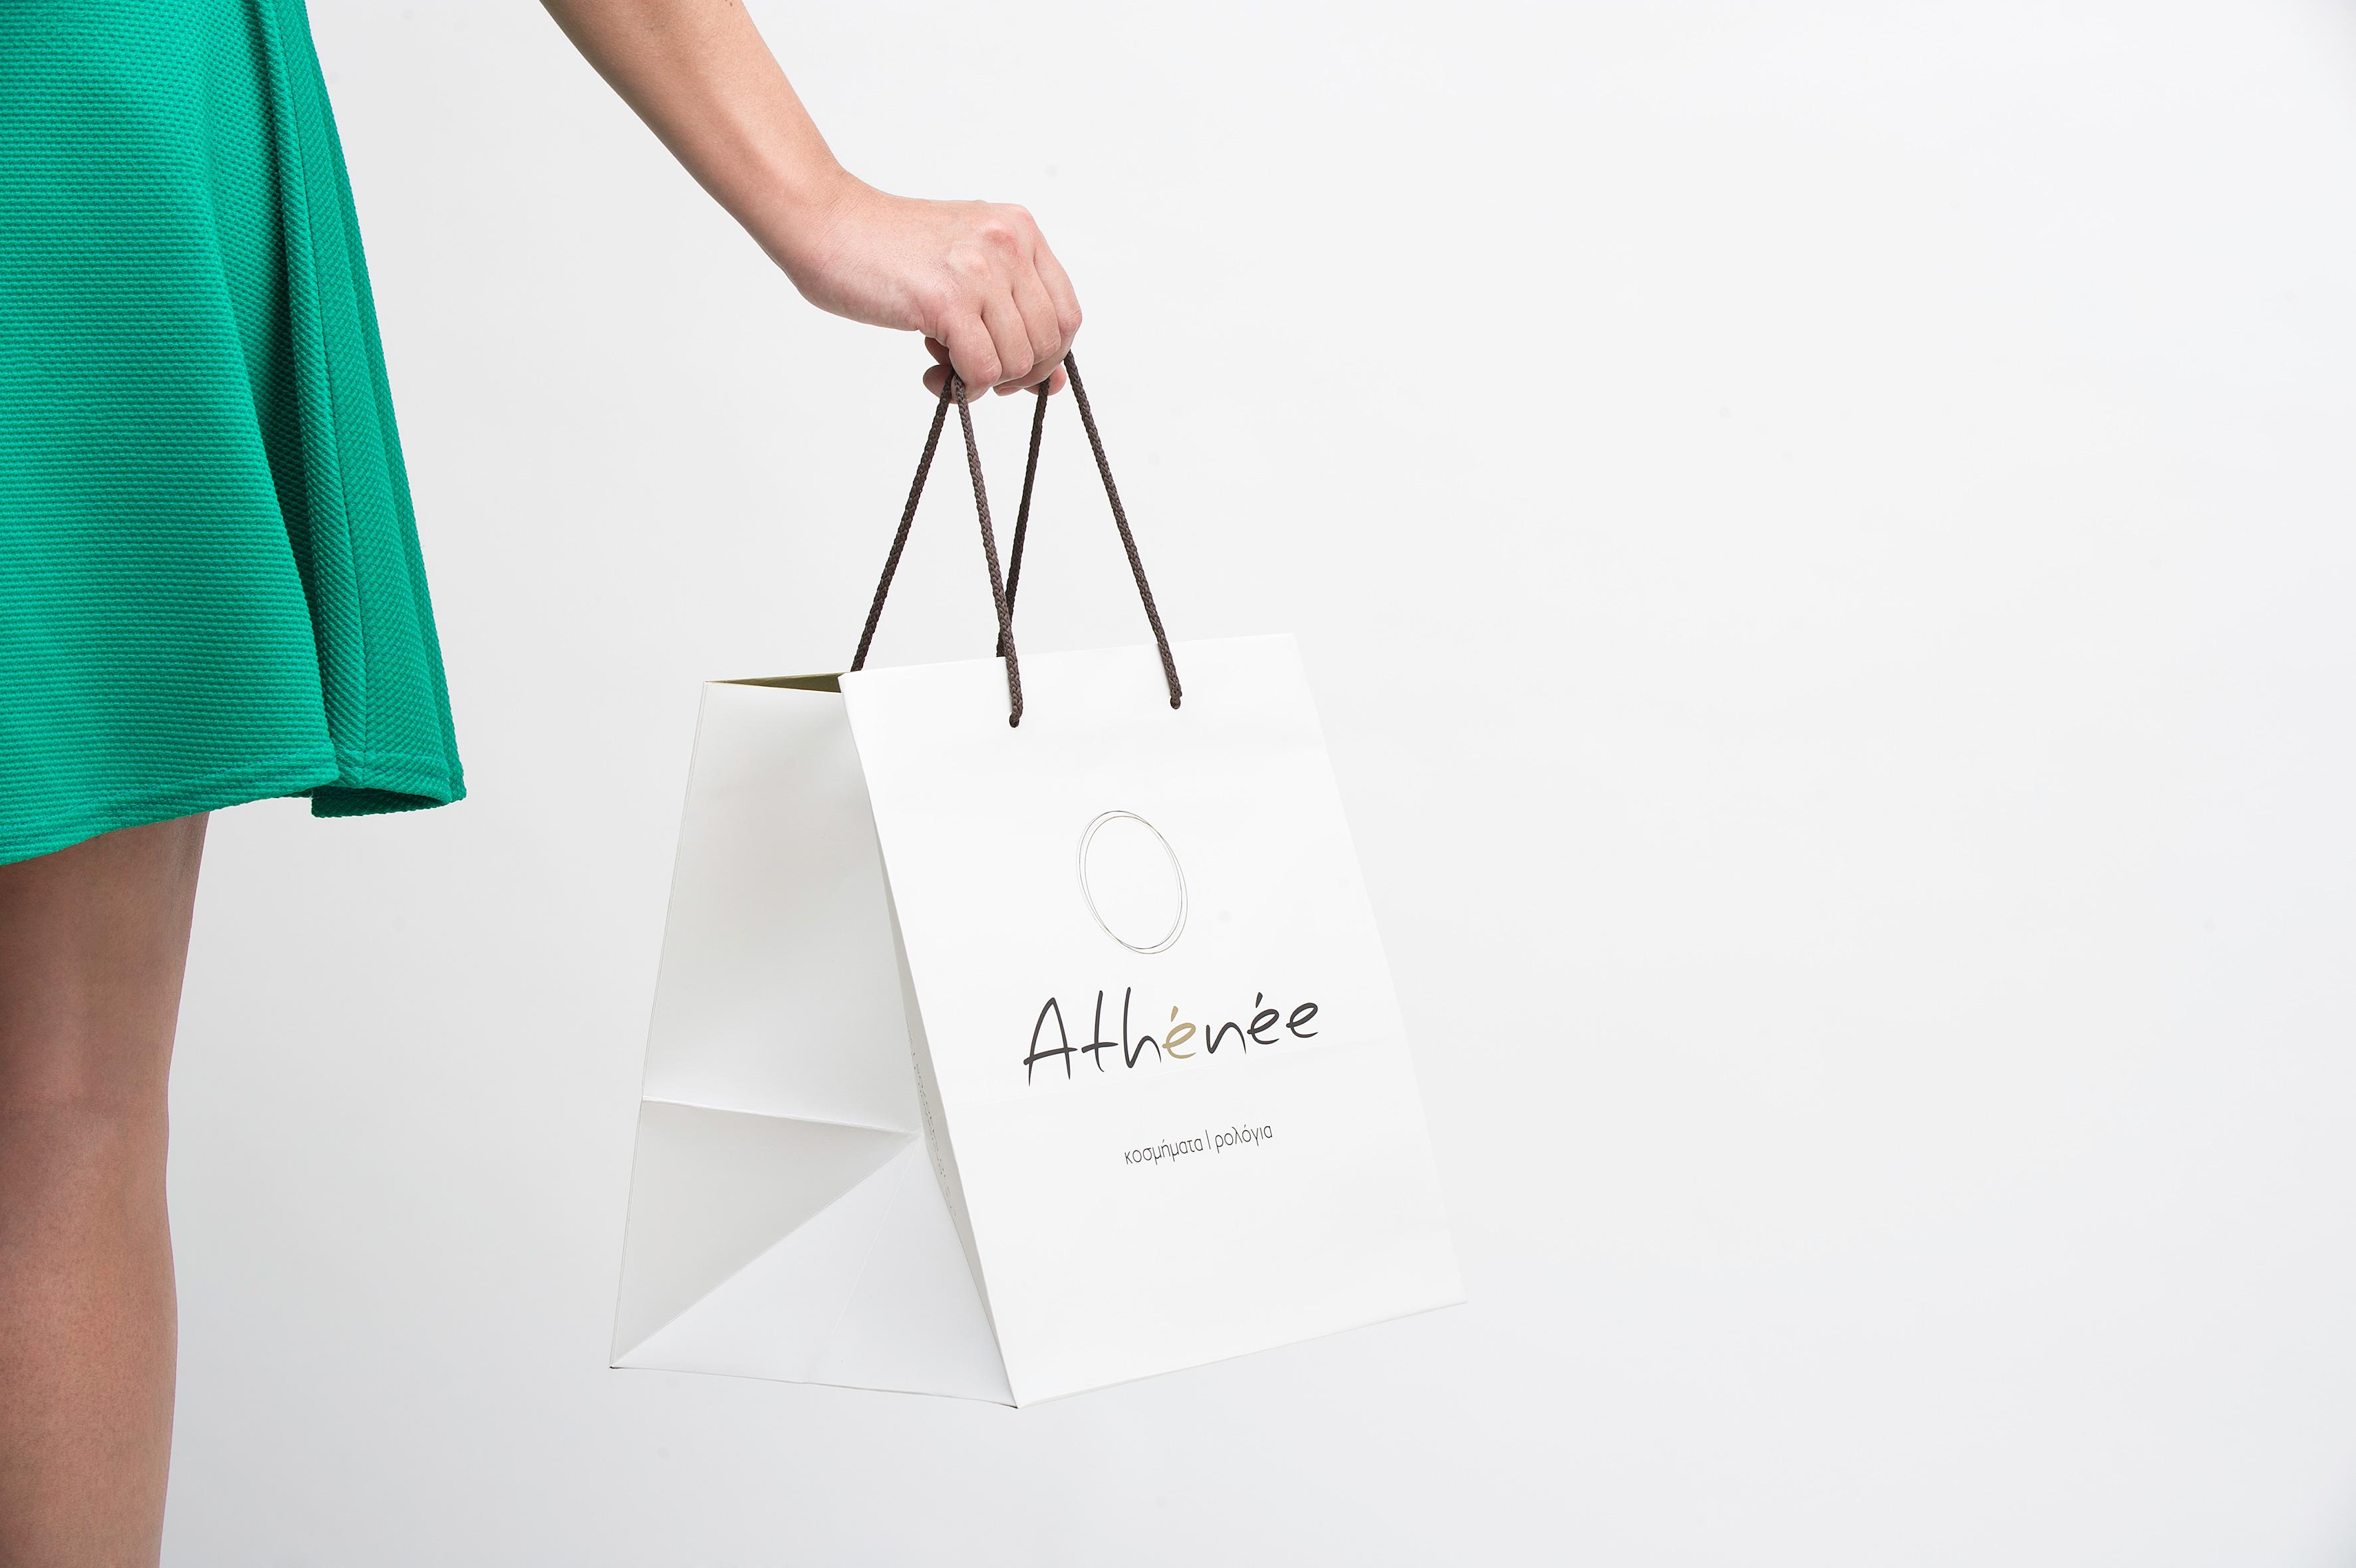 Athenee_D3S5259-copy